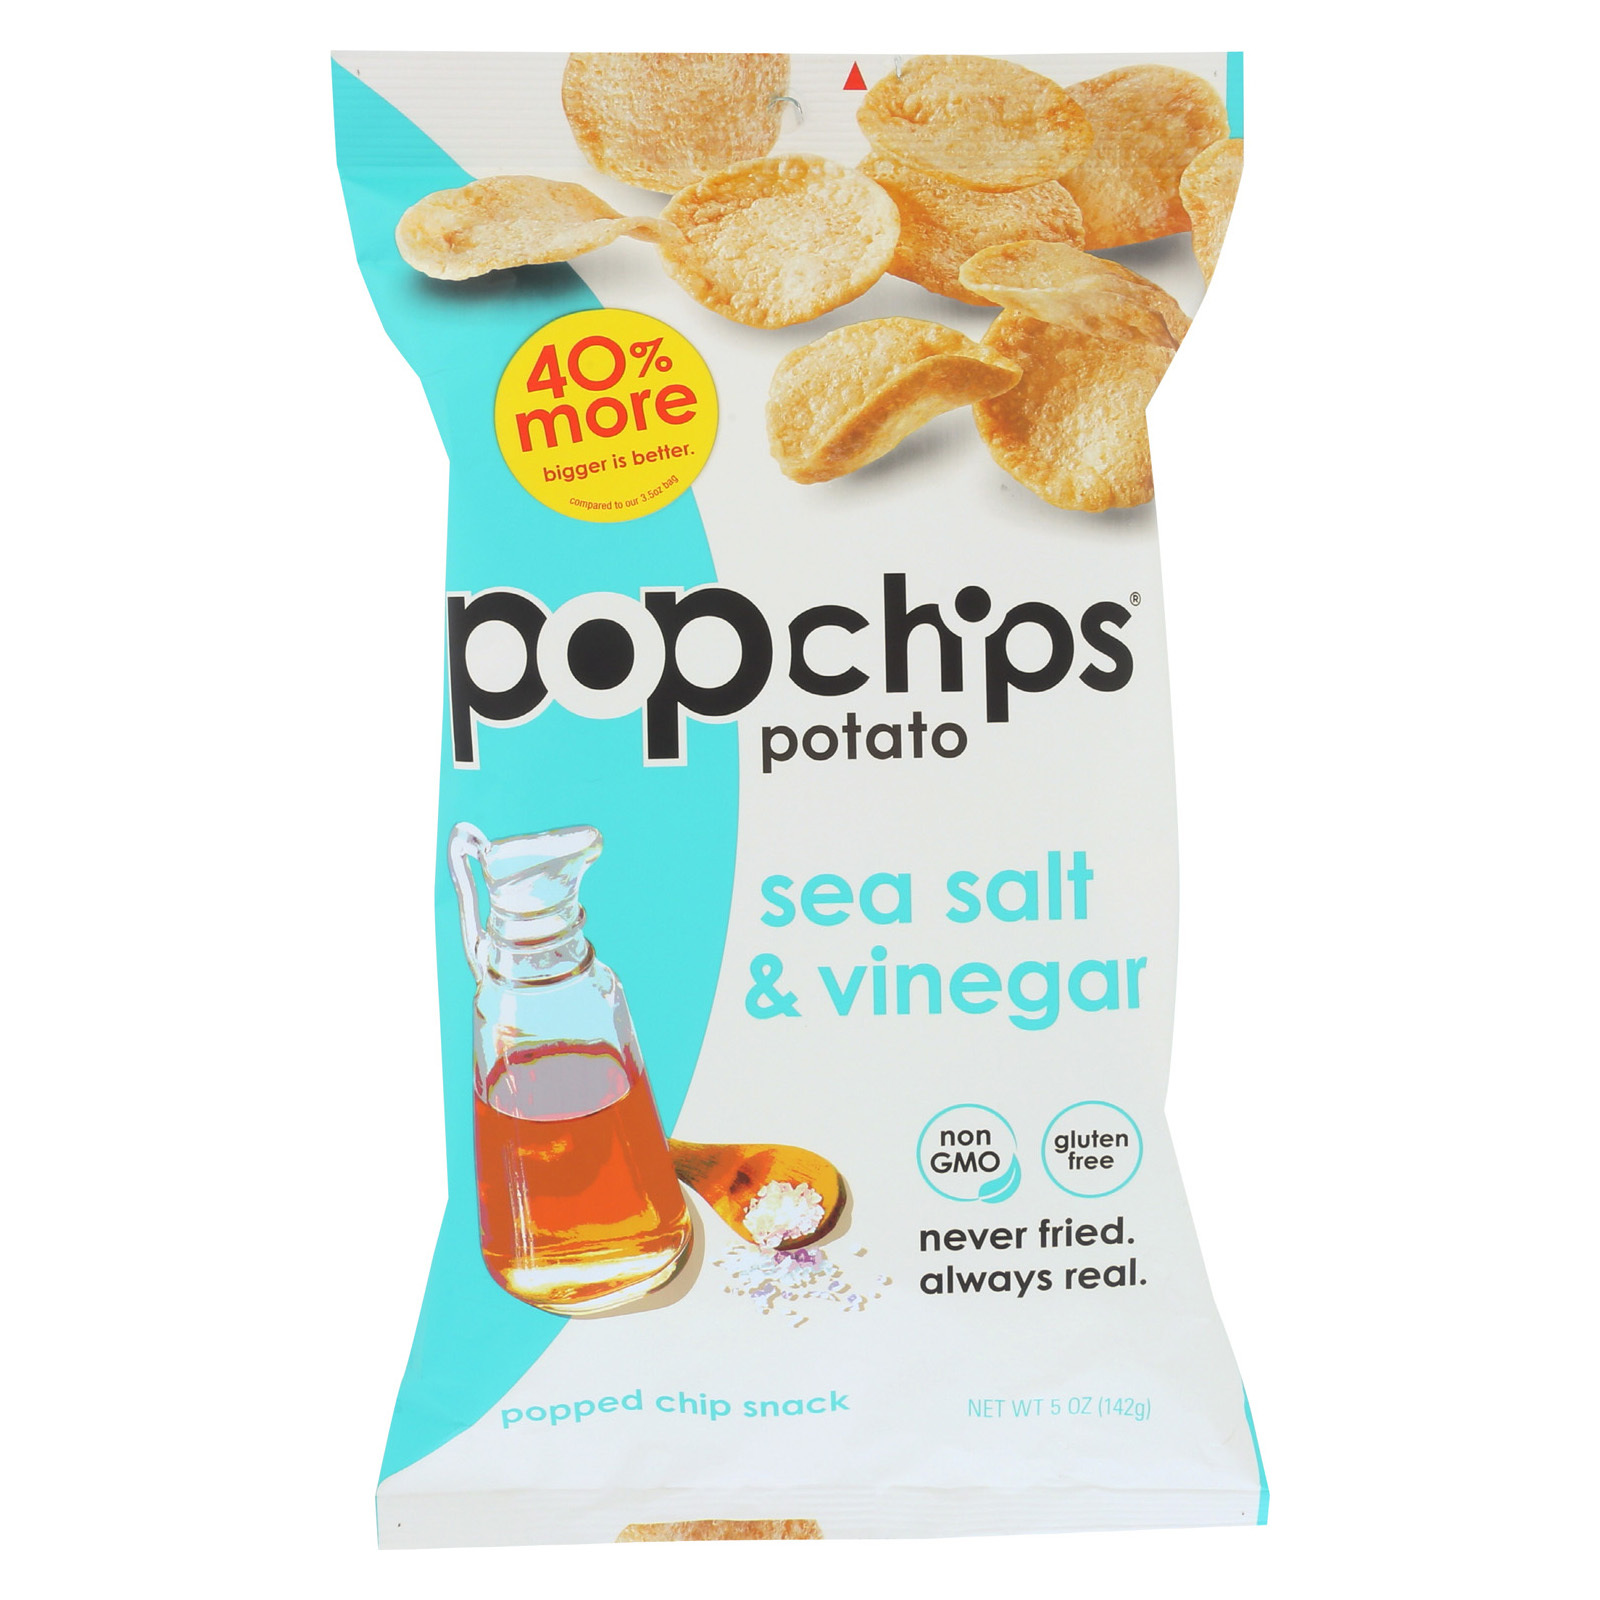 Popchips Potato Chip - Sea Salt - Vinegar - Case of 12 - 5 oz